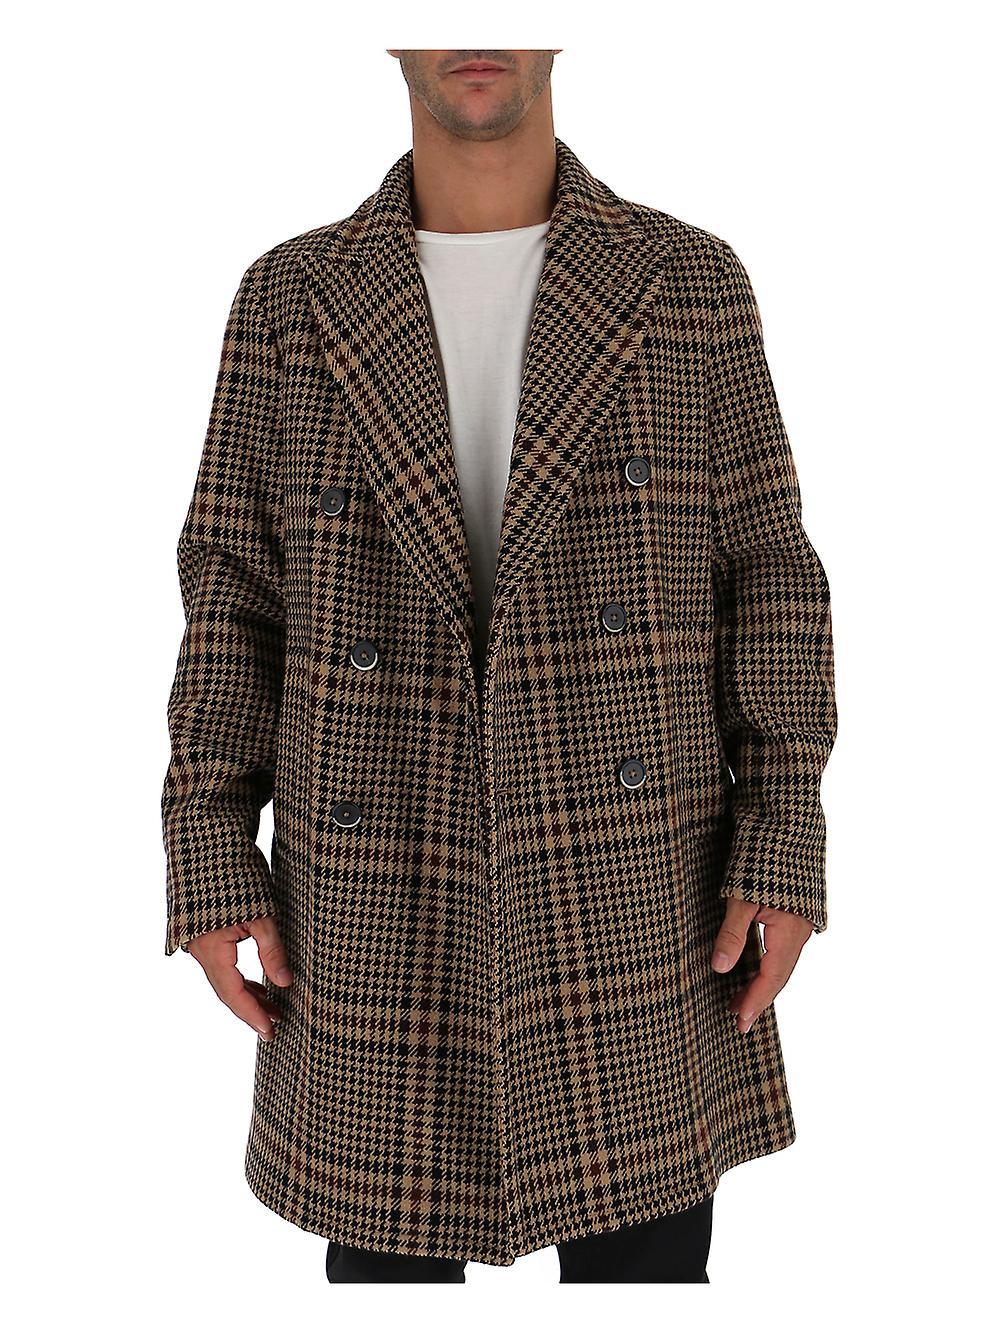 Barena Barena Venezia Venezia Wolle brauner Mantel CxhBtdsQr